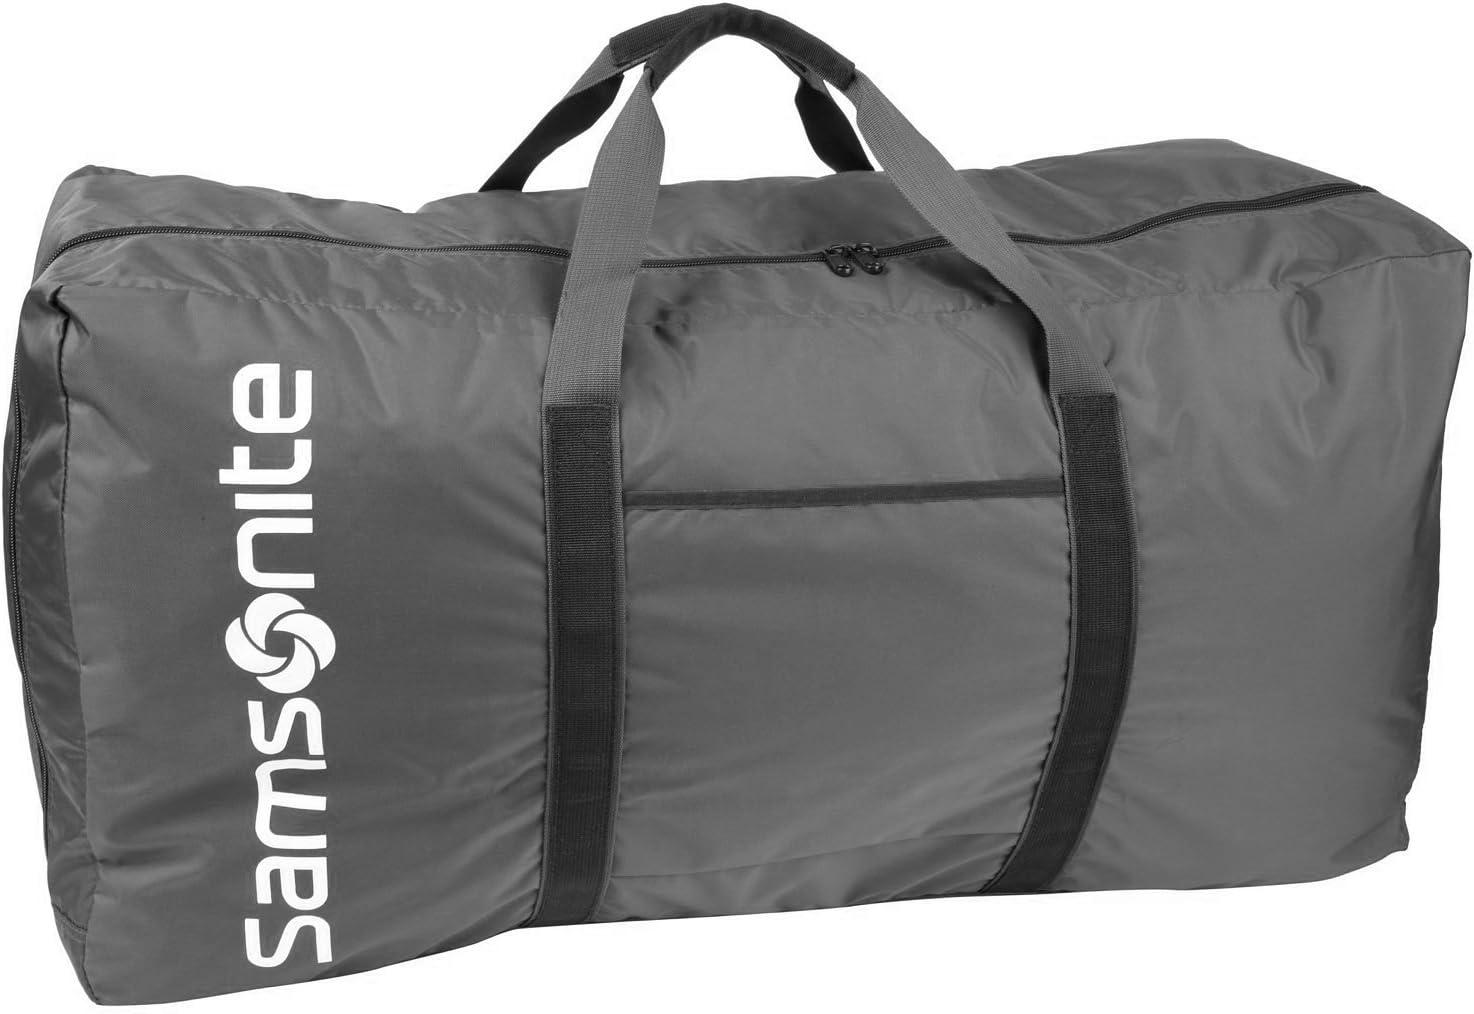 Samsonite Tote-A-Ton 32.5-Inch Duffel (Charcoal, Single)